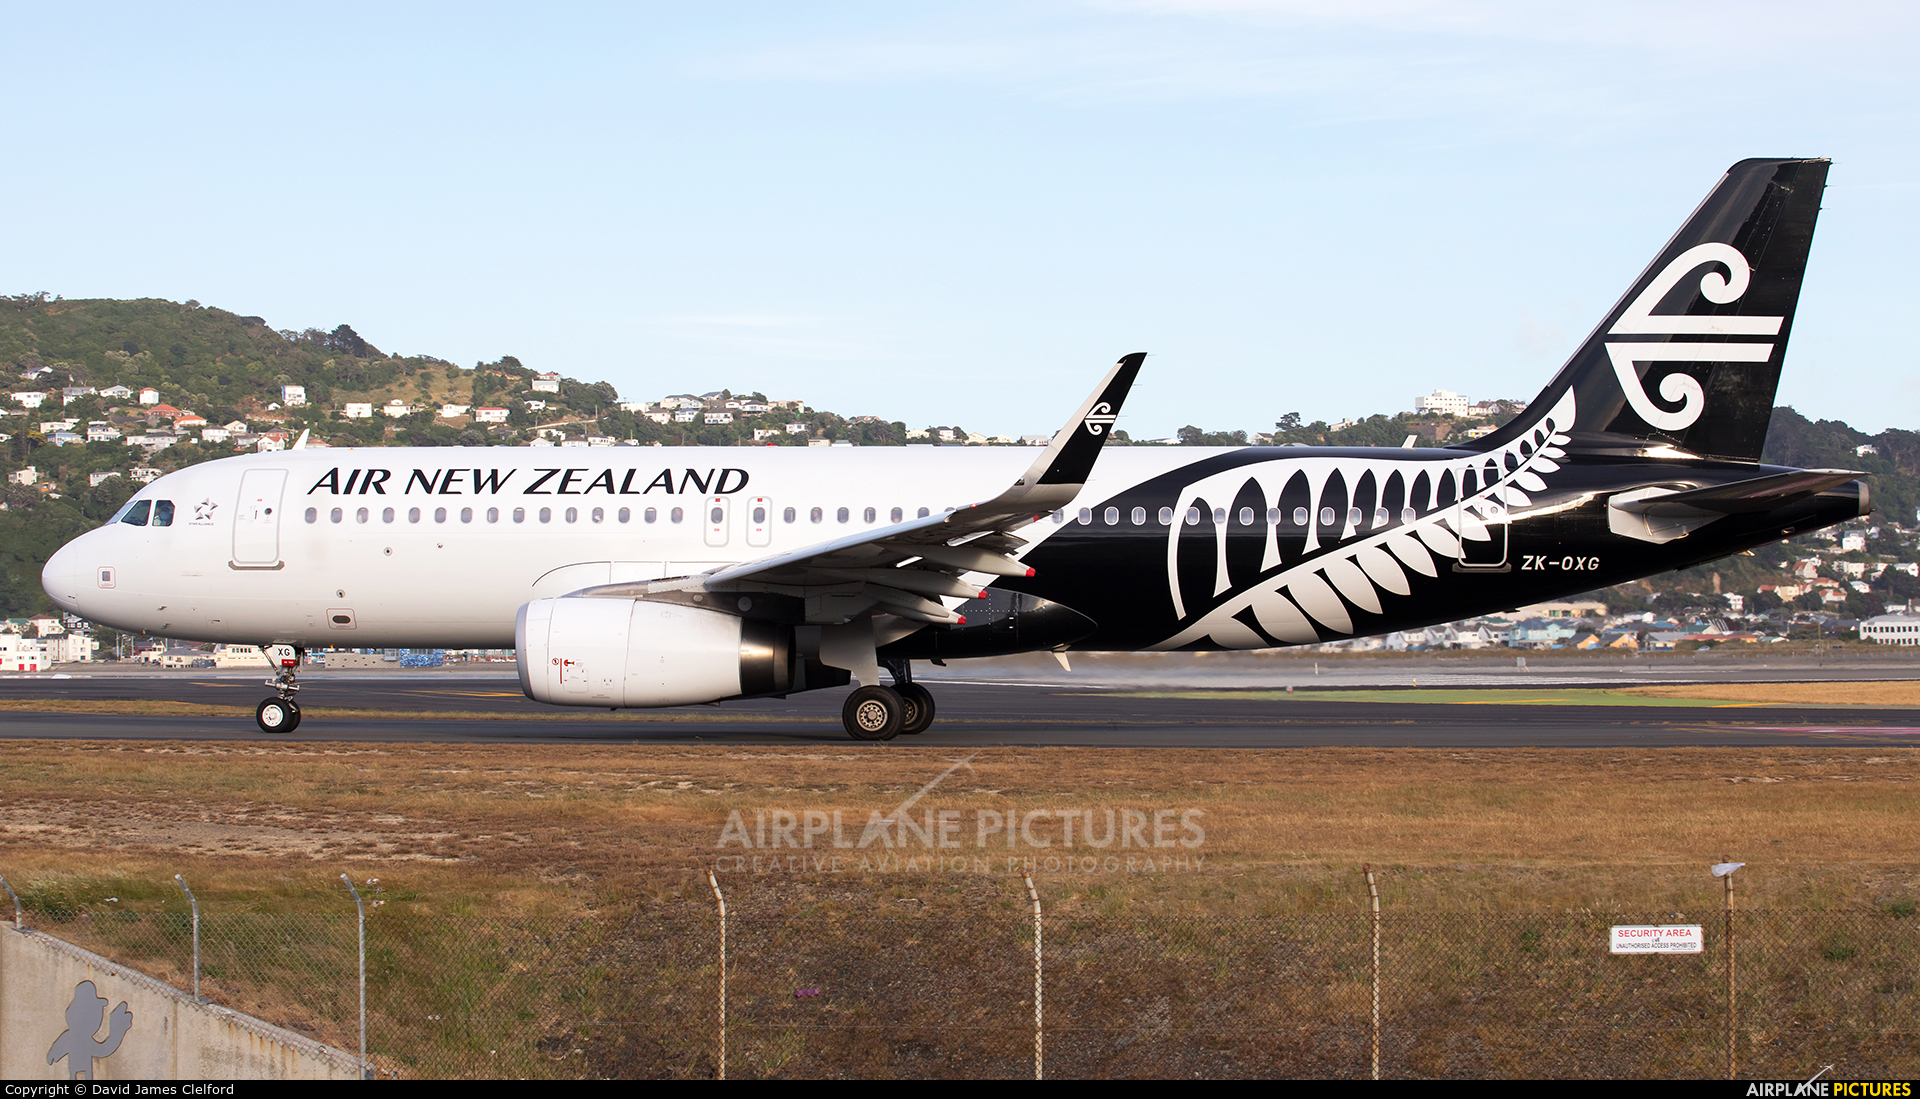 Air New Zealand ZK-OXG aircraft at Wellington Intl